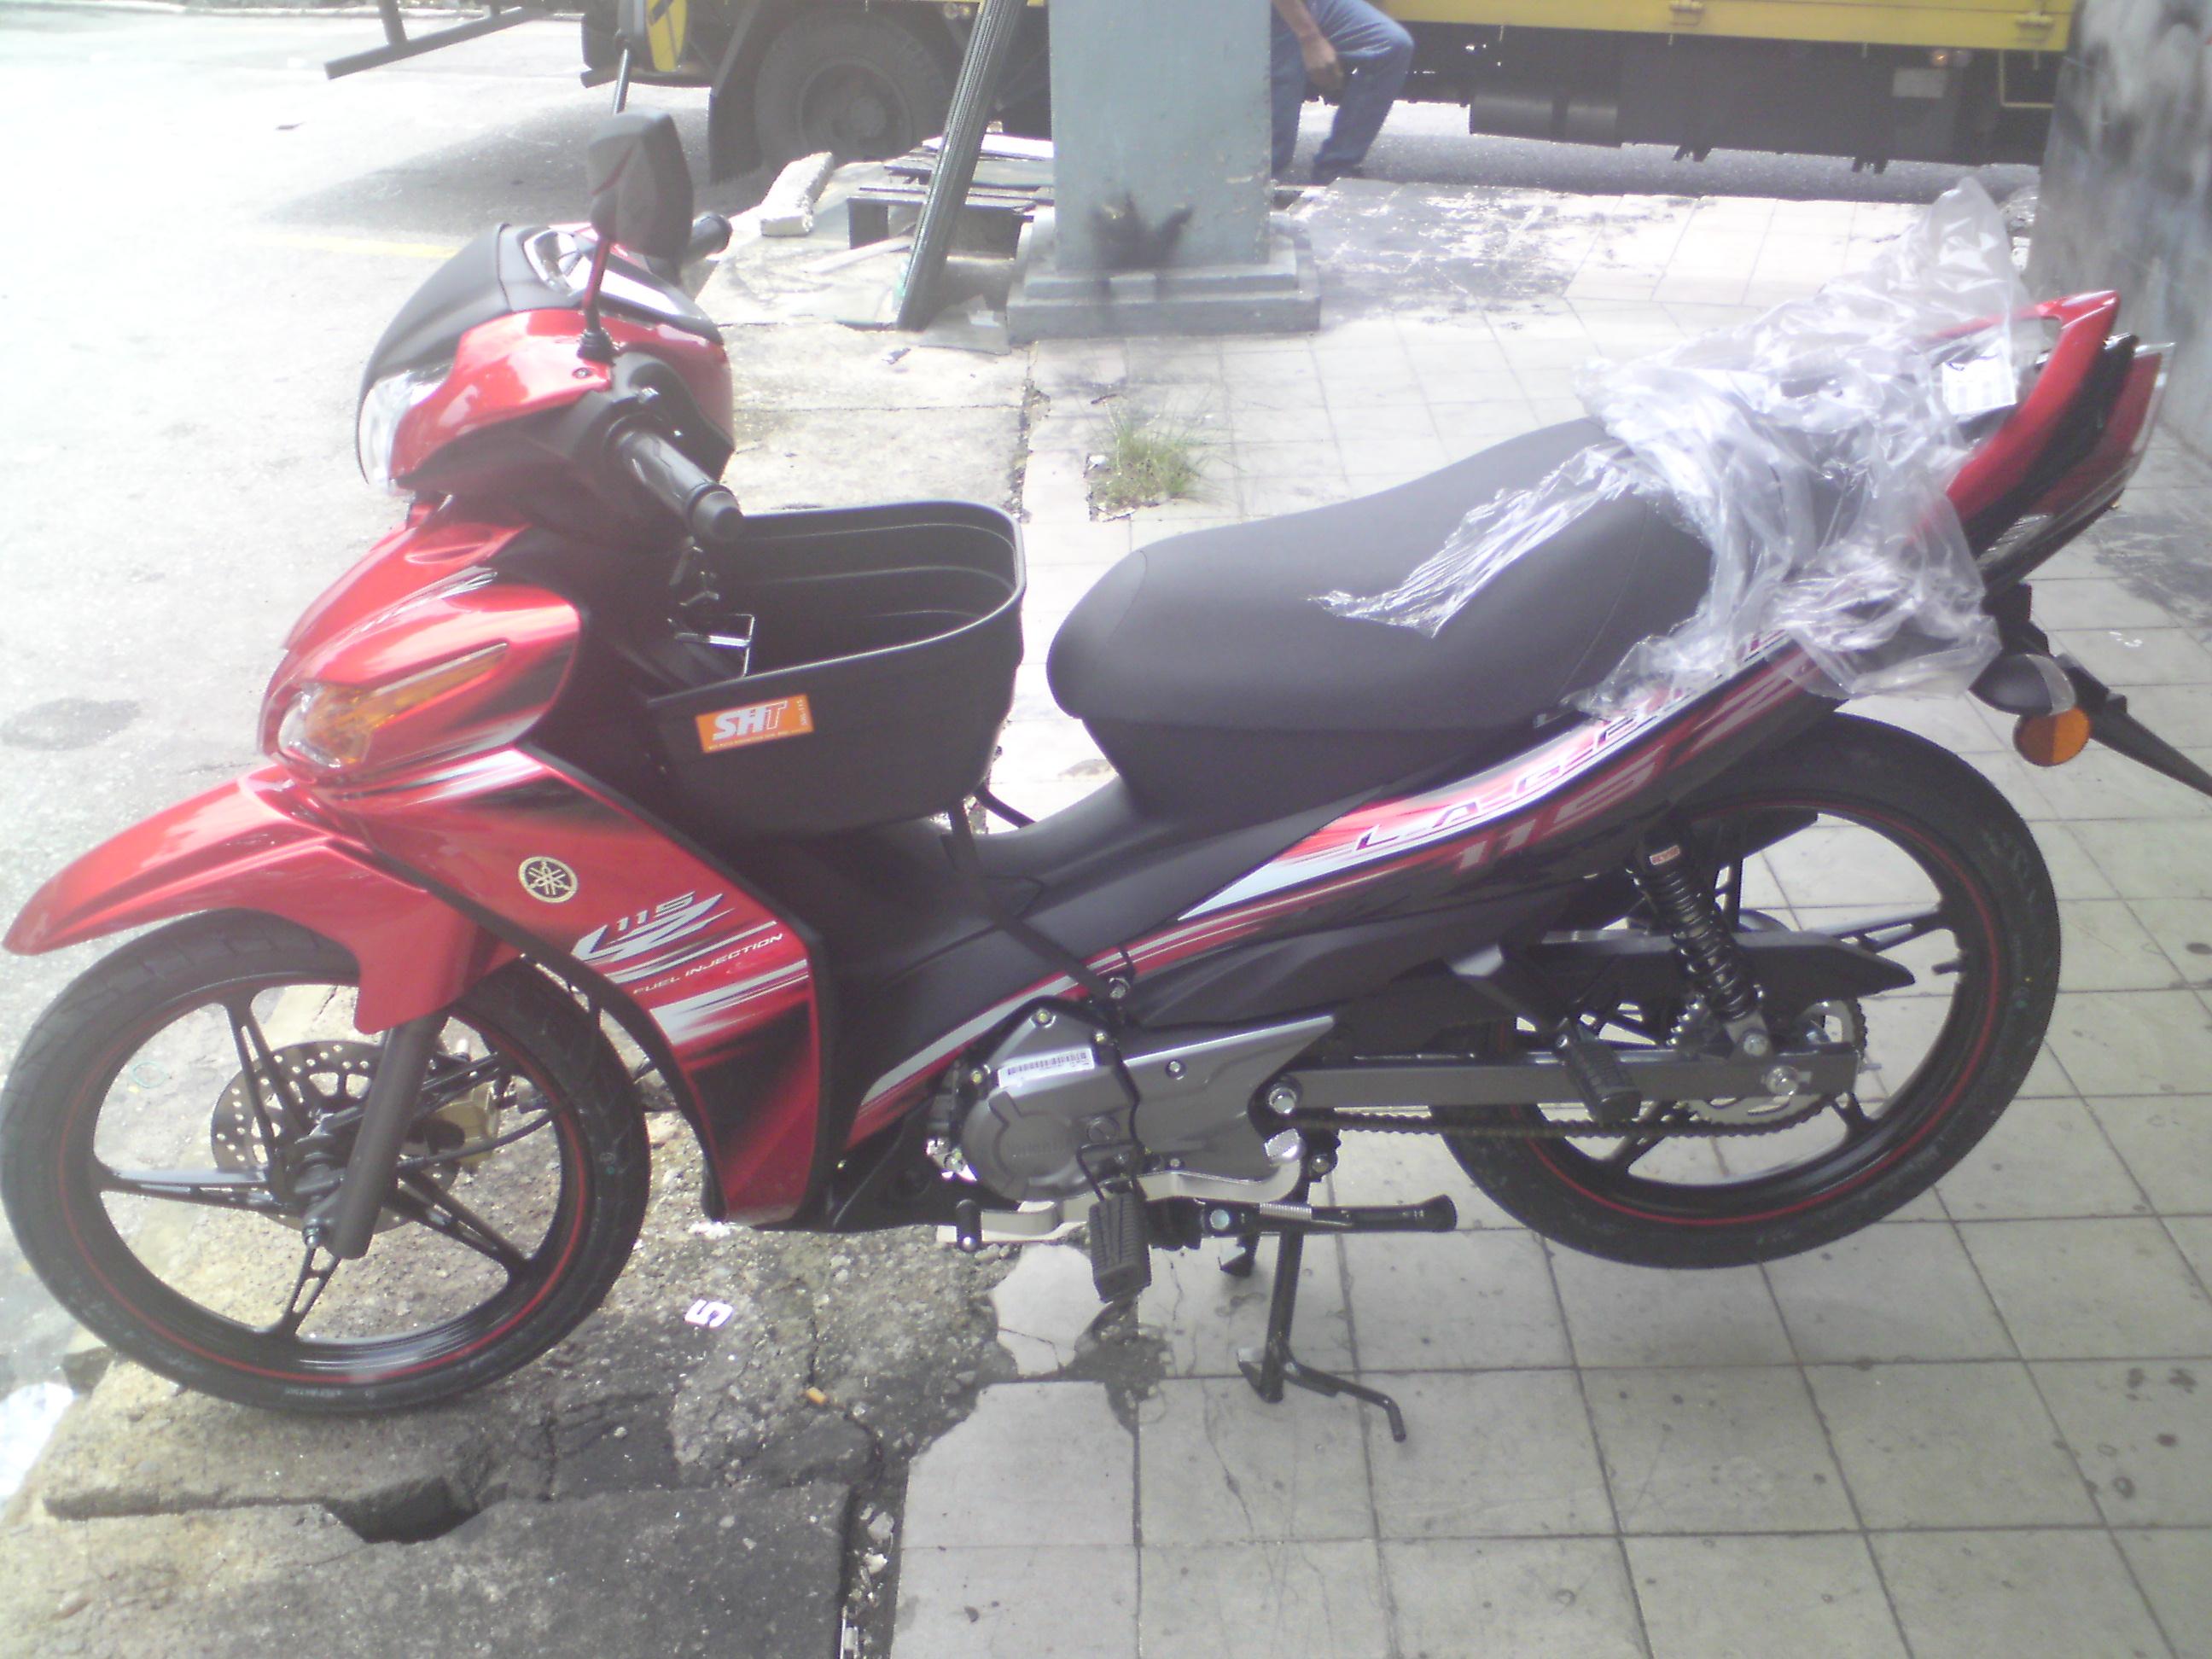 File:Hezery99-Yamaha-Lagenda-115Z-Fuel-Injection.JPG